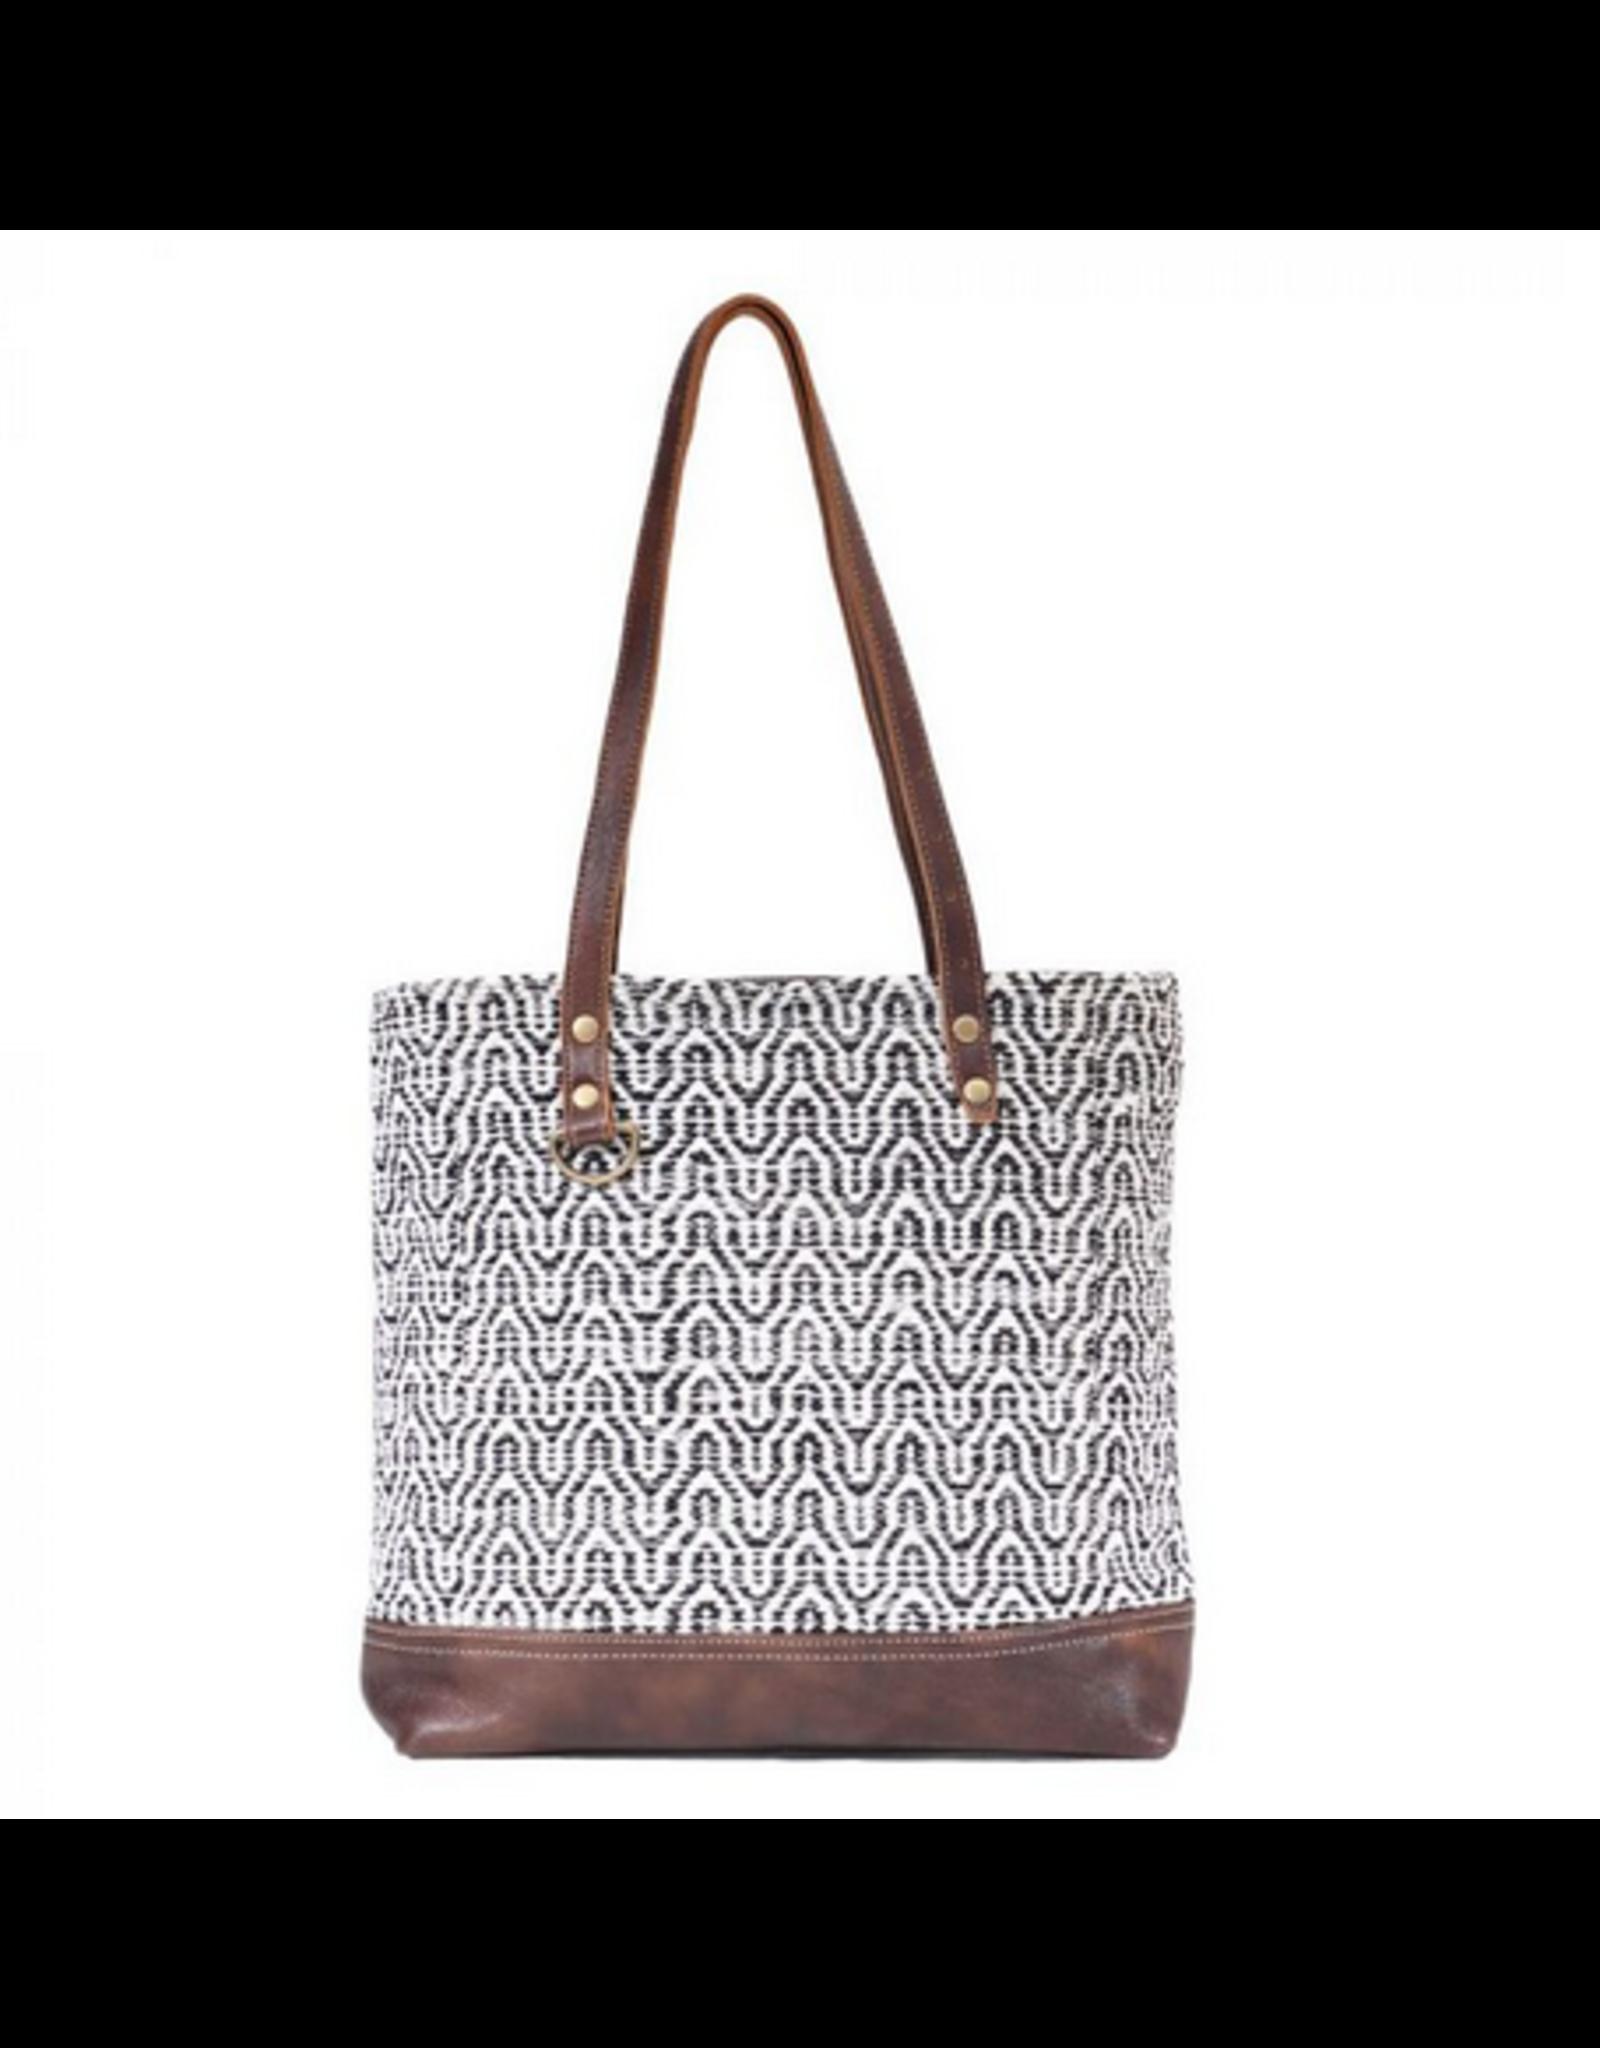 Blissy Tote Bag